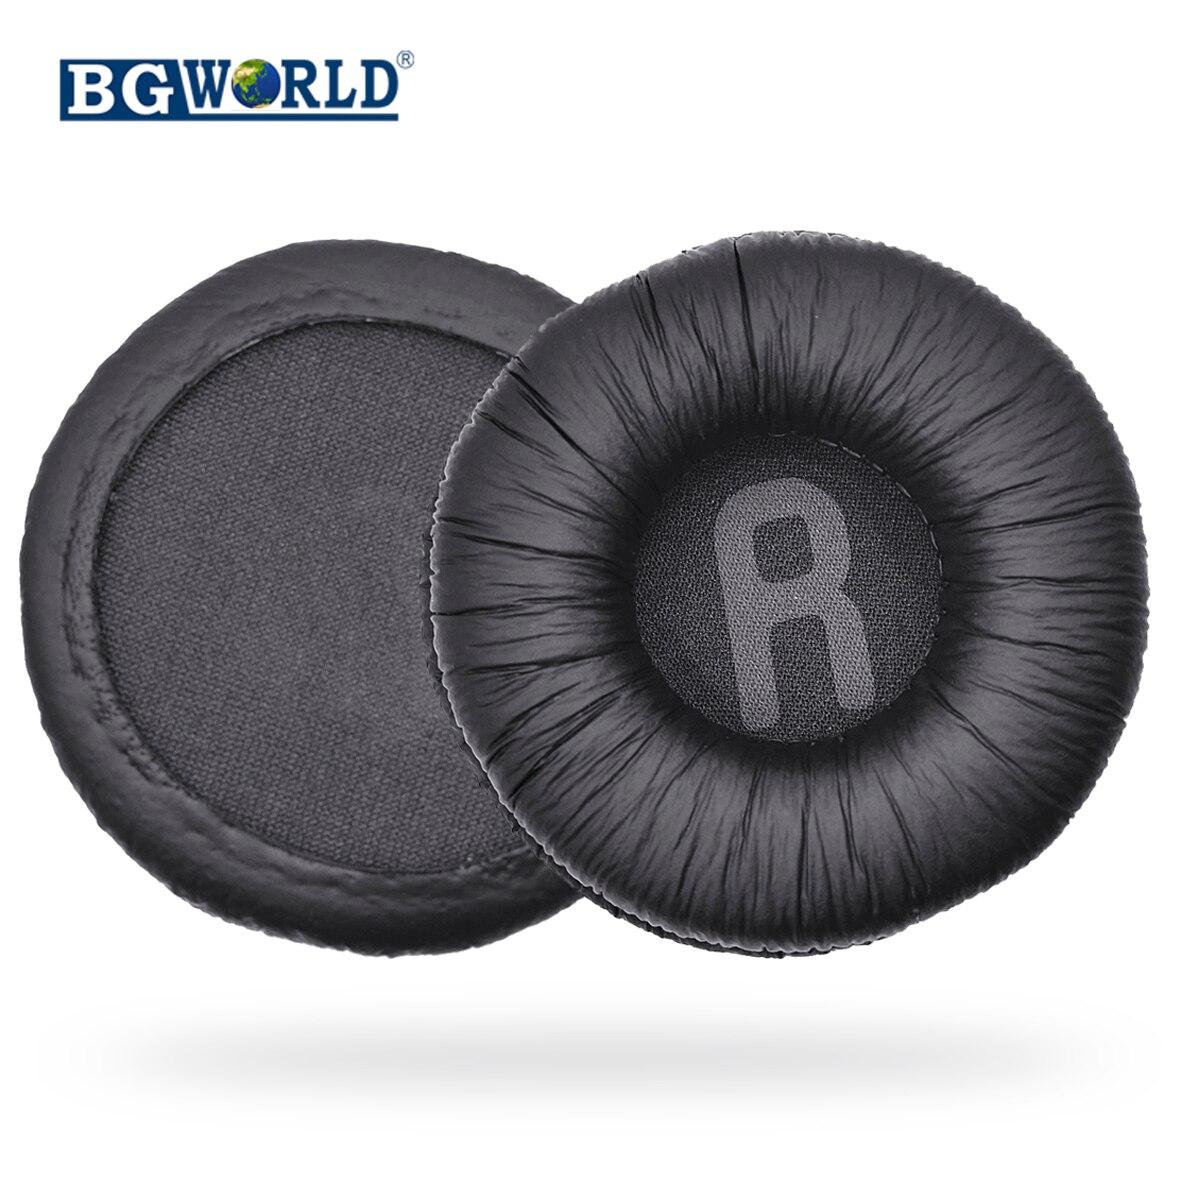 BGWORLD Replacement  black 70mm 7cm 2.75inch ear pads cushion earpad for headphone